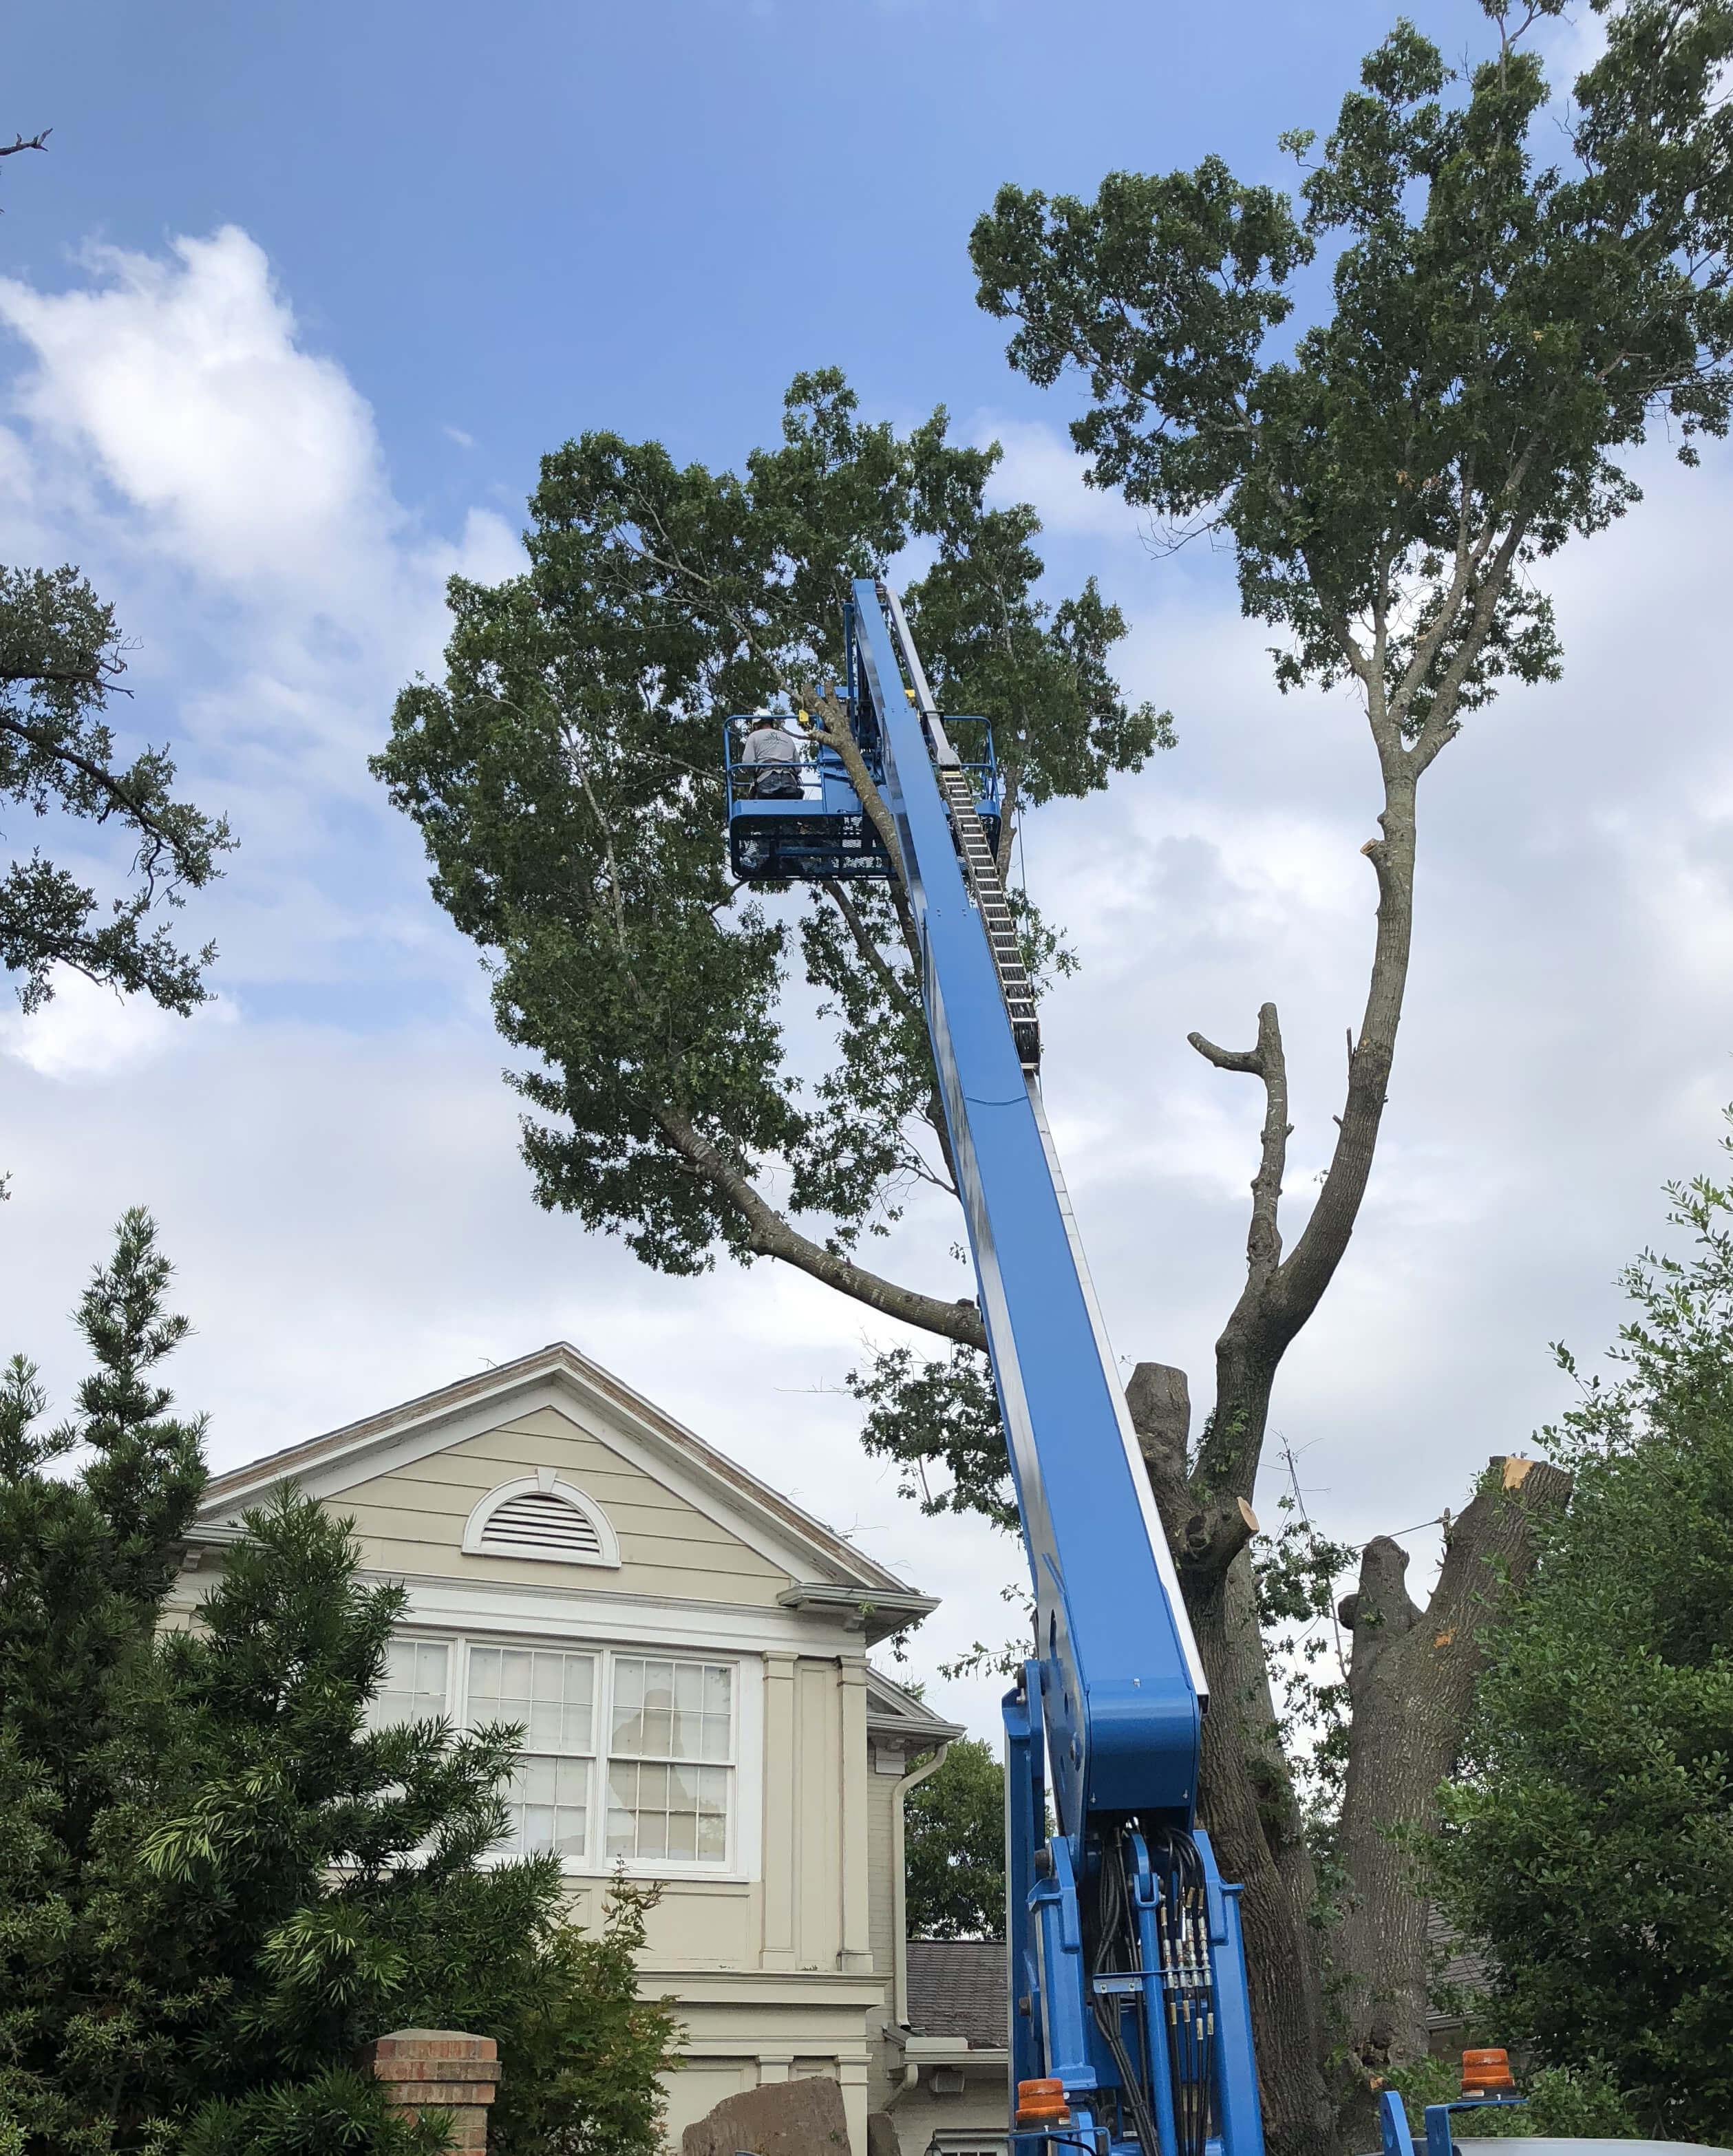 Tree Services Waco Texas | Tree Care | Lawn Maintenance | Landscaping Waco